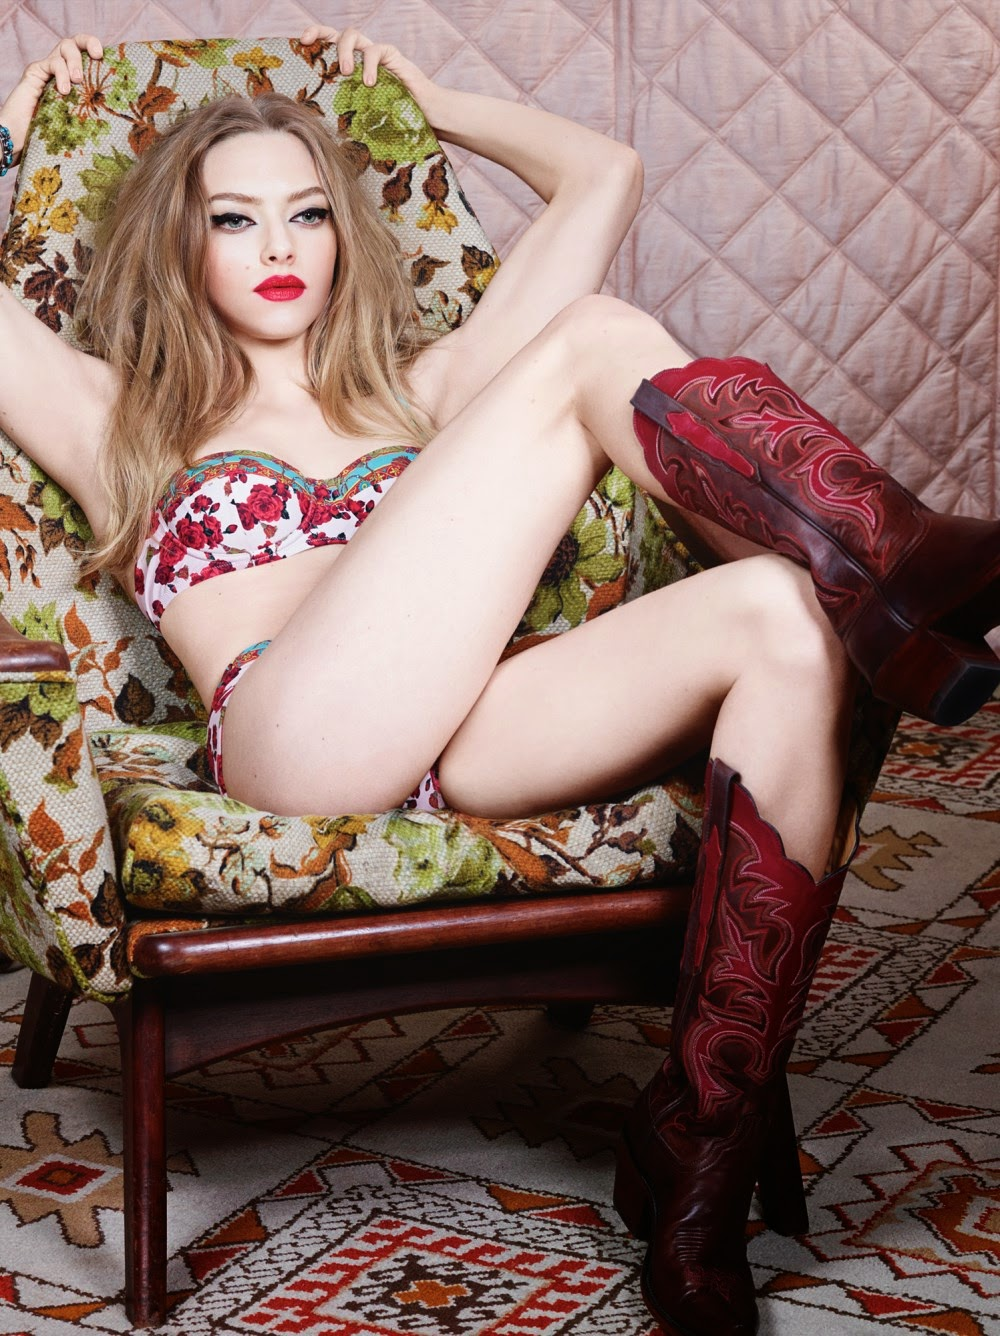 Amanda Seyfried strips to her underwear for racy photo shoot